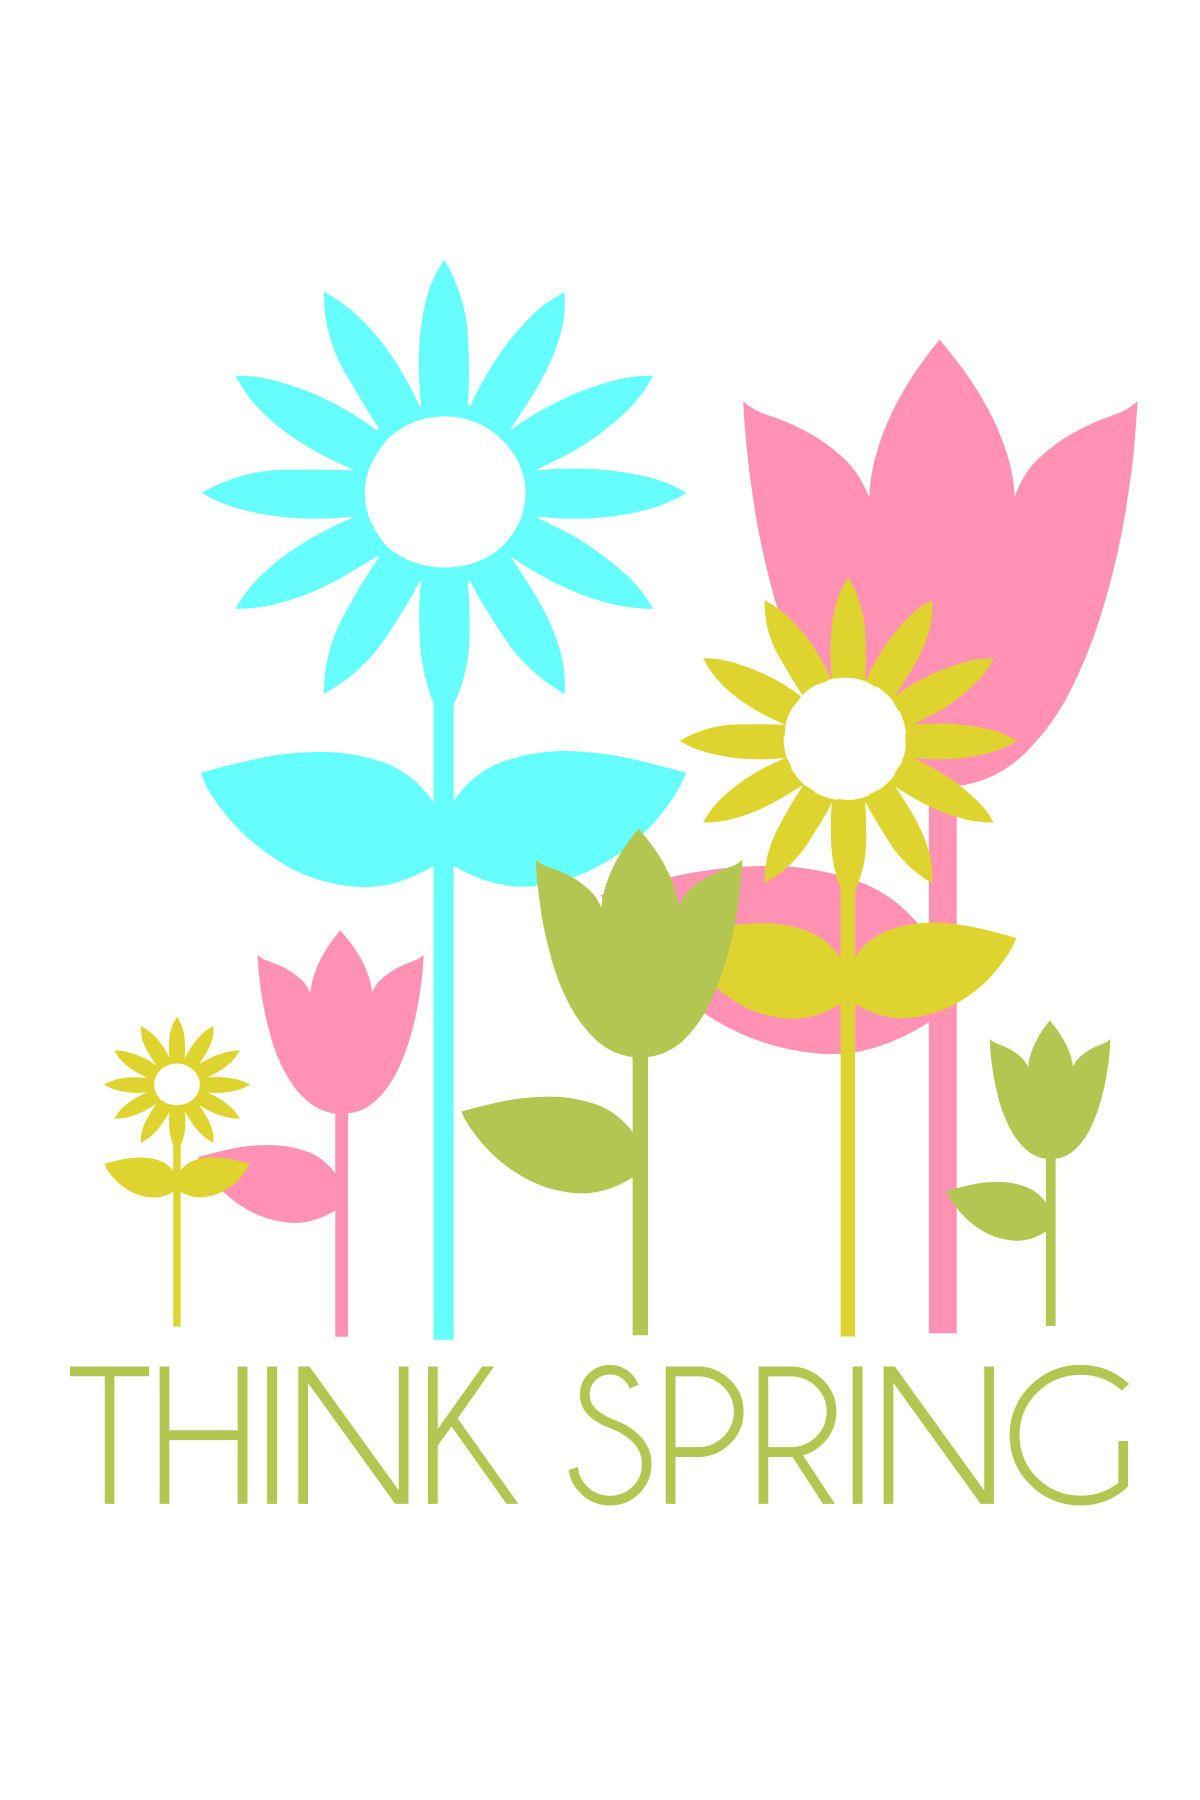 Spring Mantel | Spring images, Spring